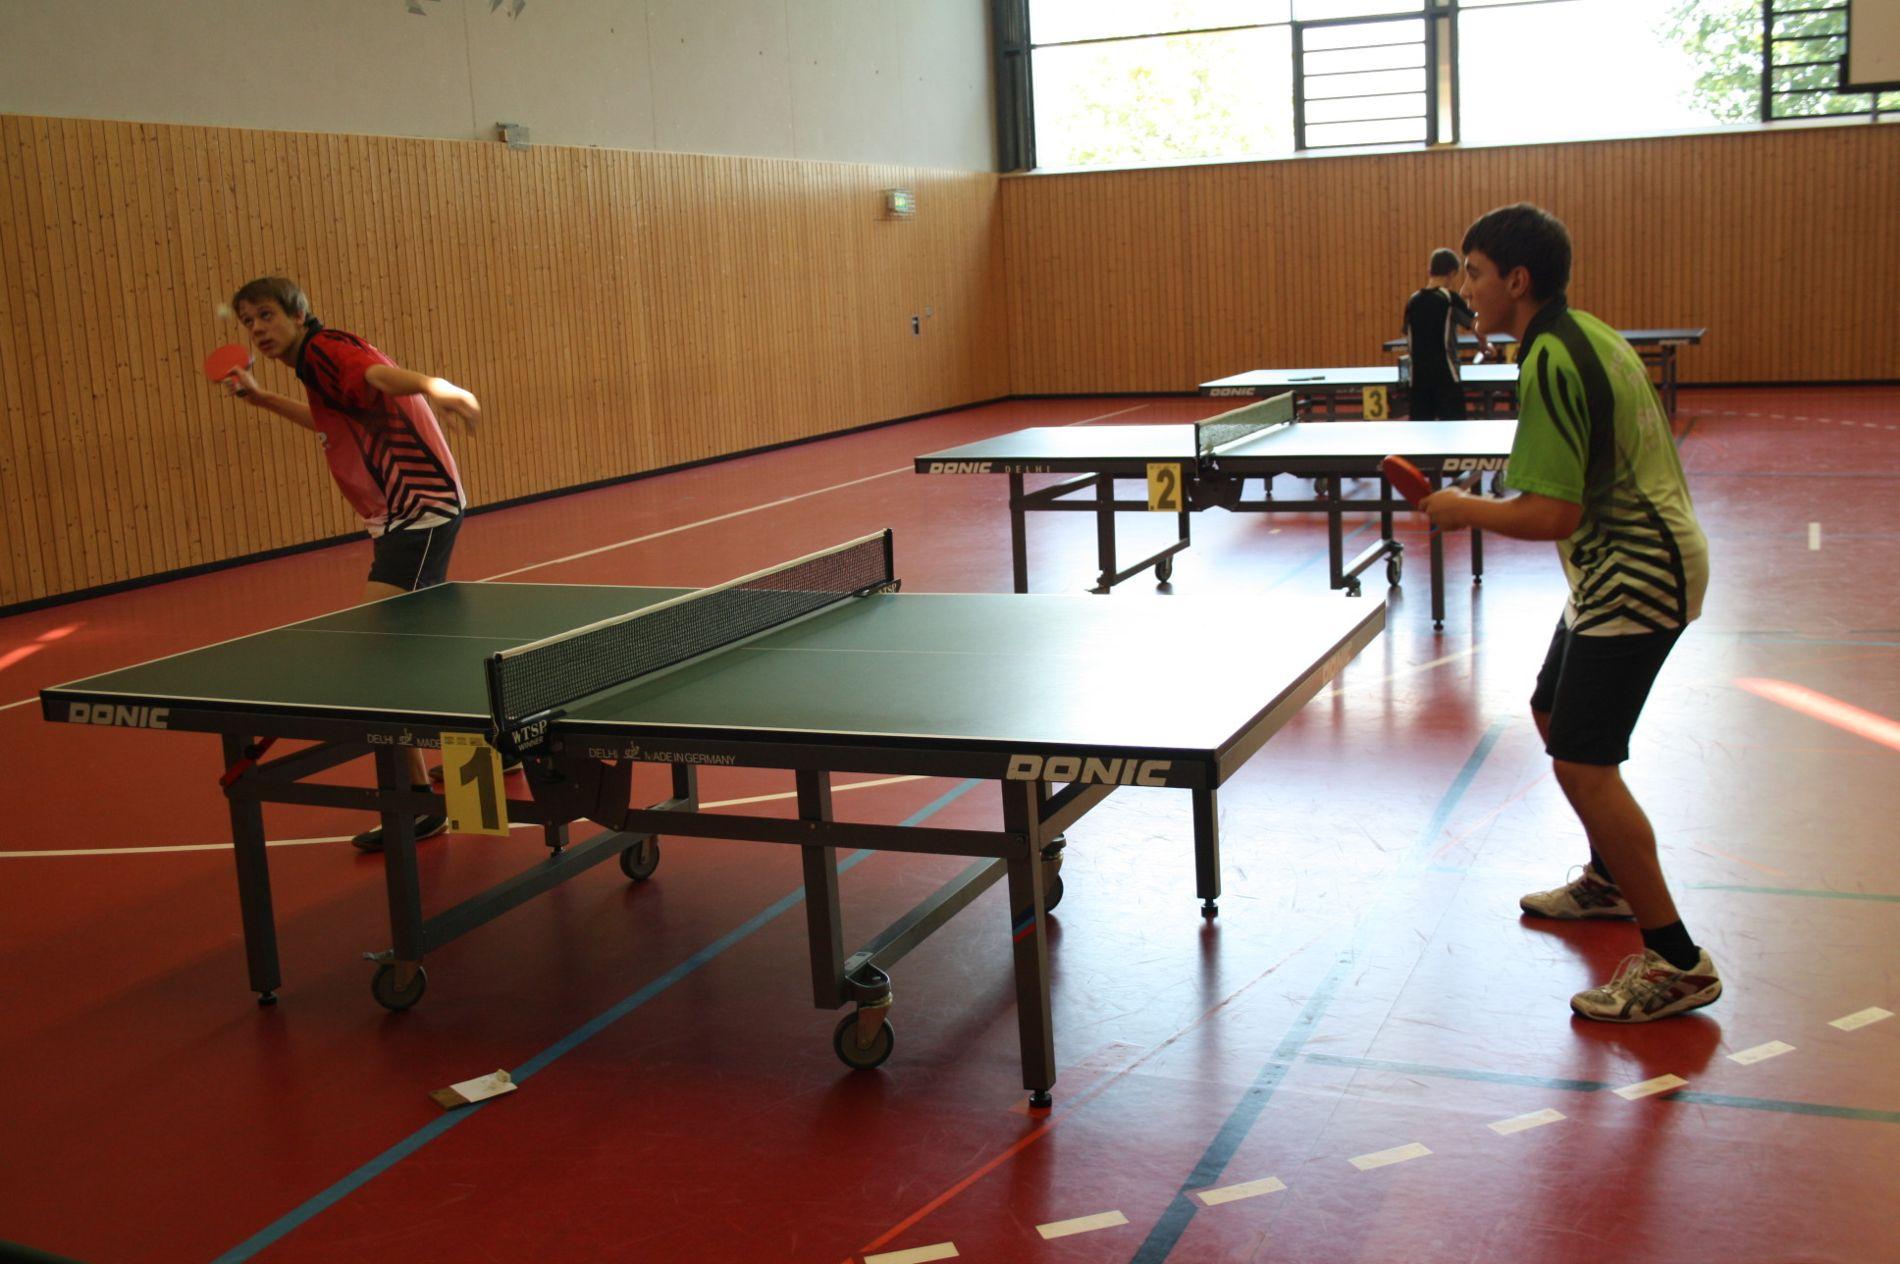 TOP 10 Turnier 2011 Bild 3